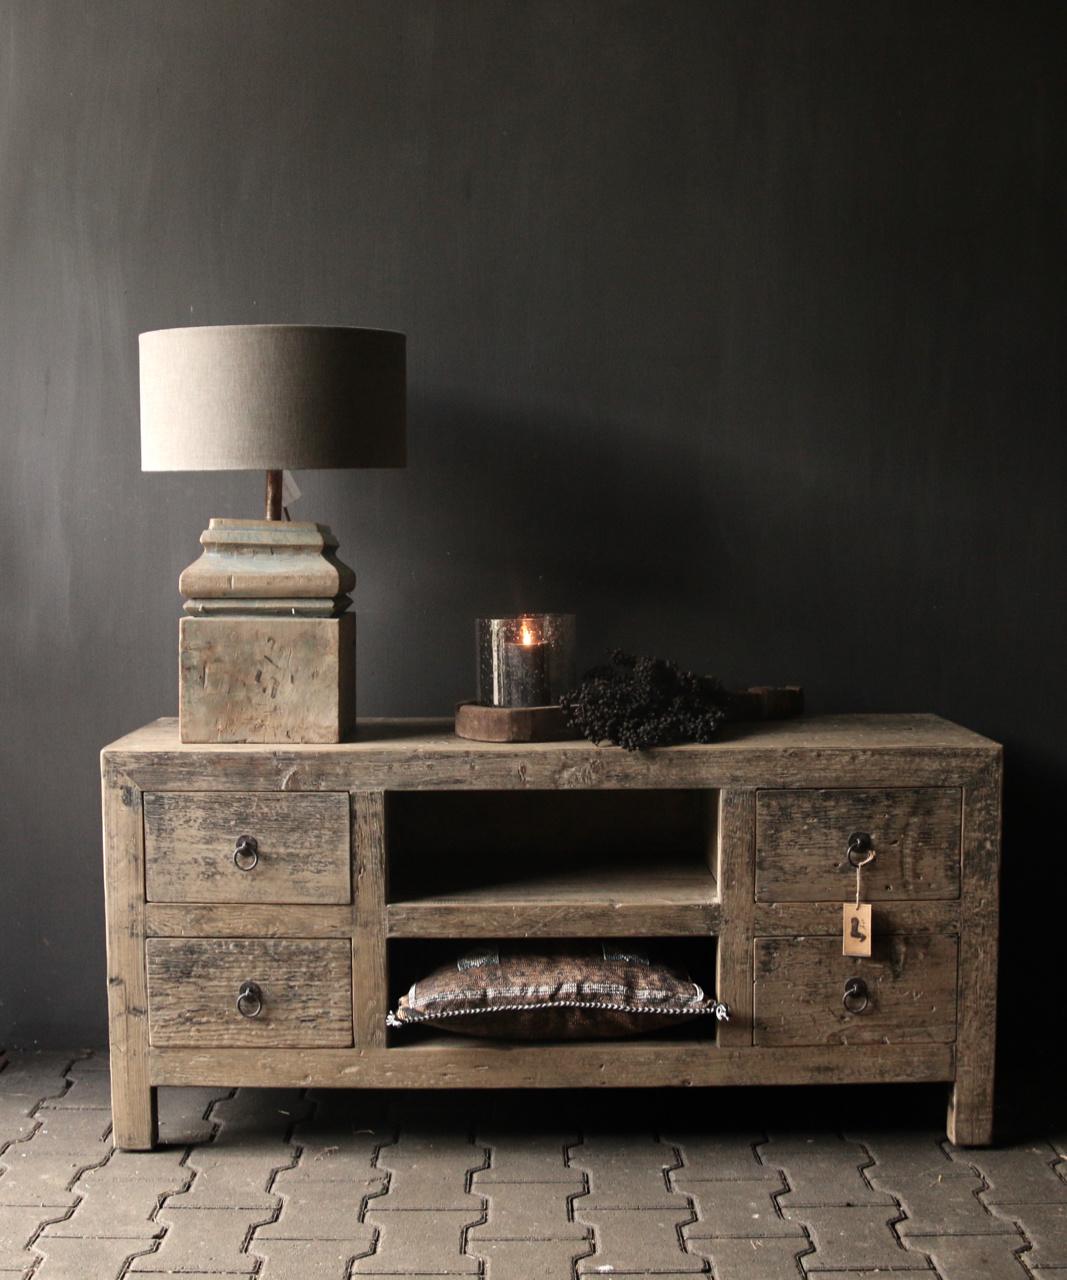 Tv Furniture / sideboard from old Elmwood-1